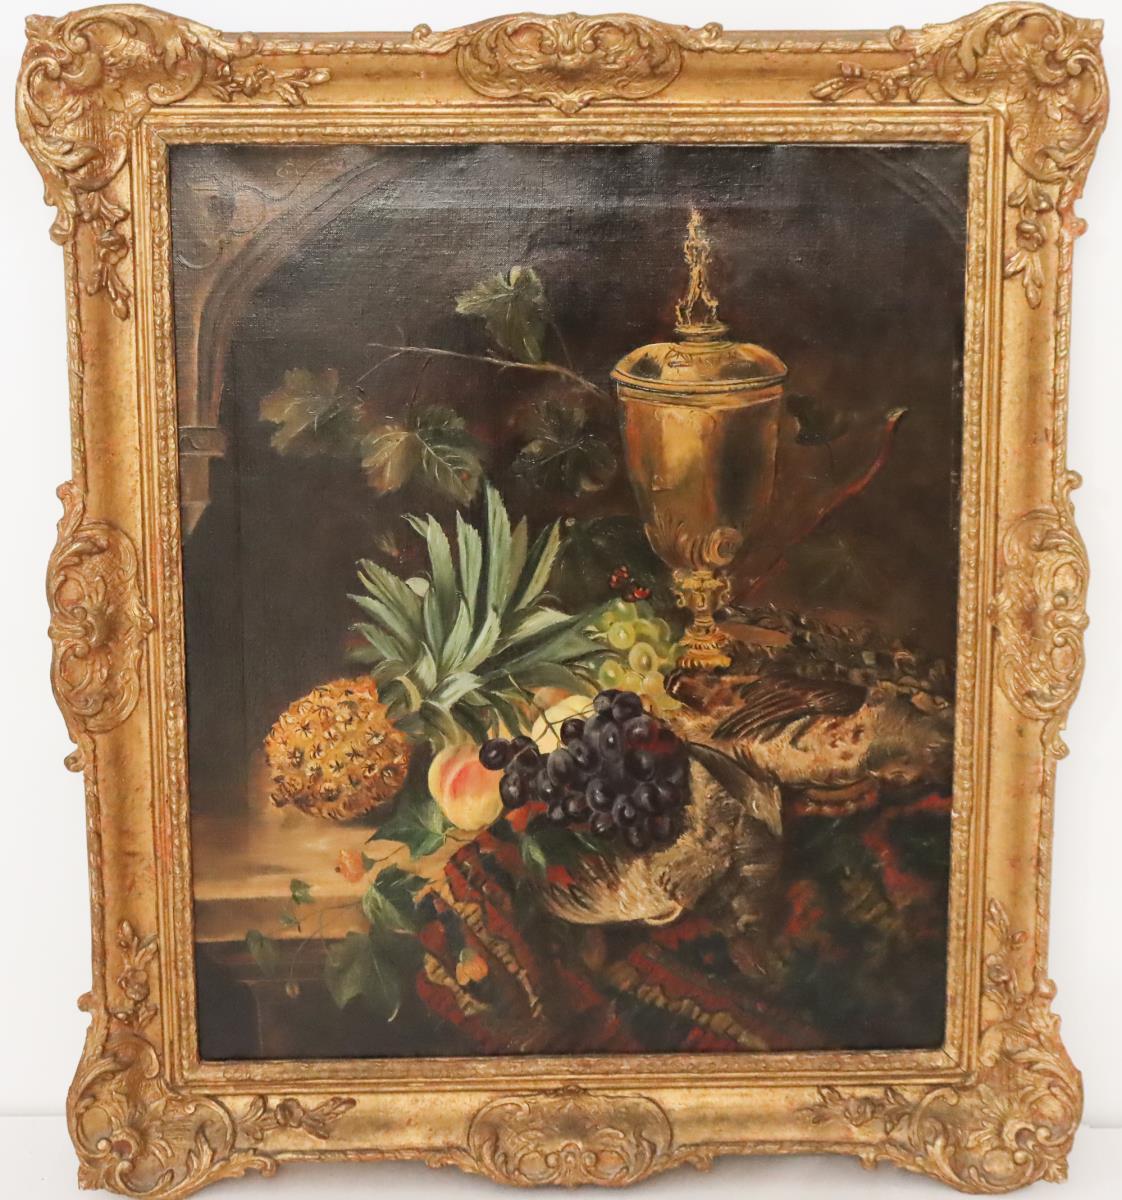 William Hughes (1842 - 1901) UK, Oil on Canvas - Image 2 of 4